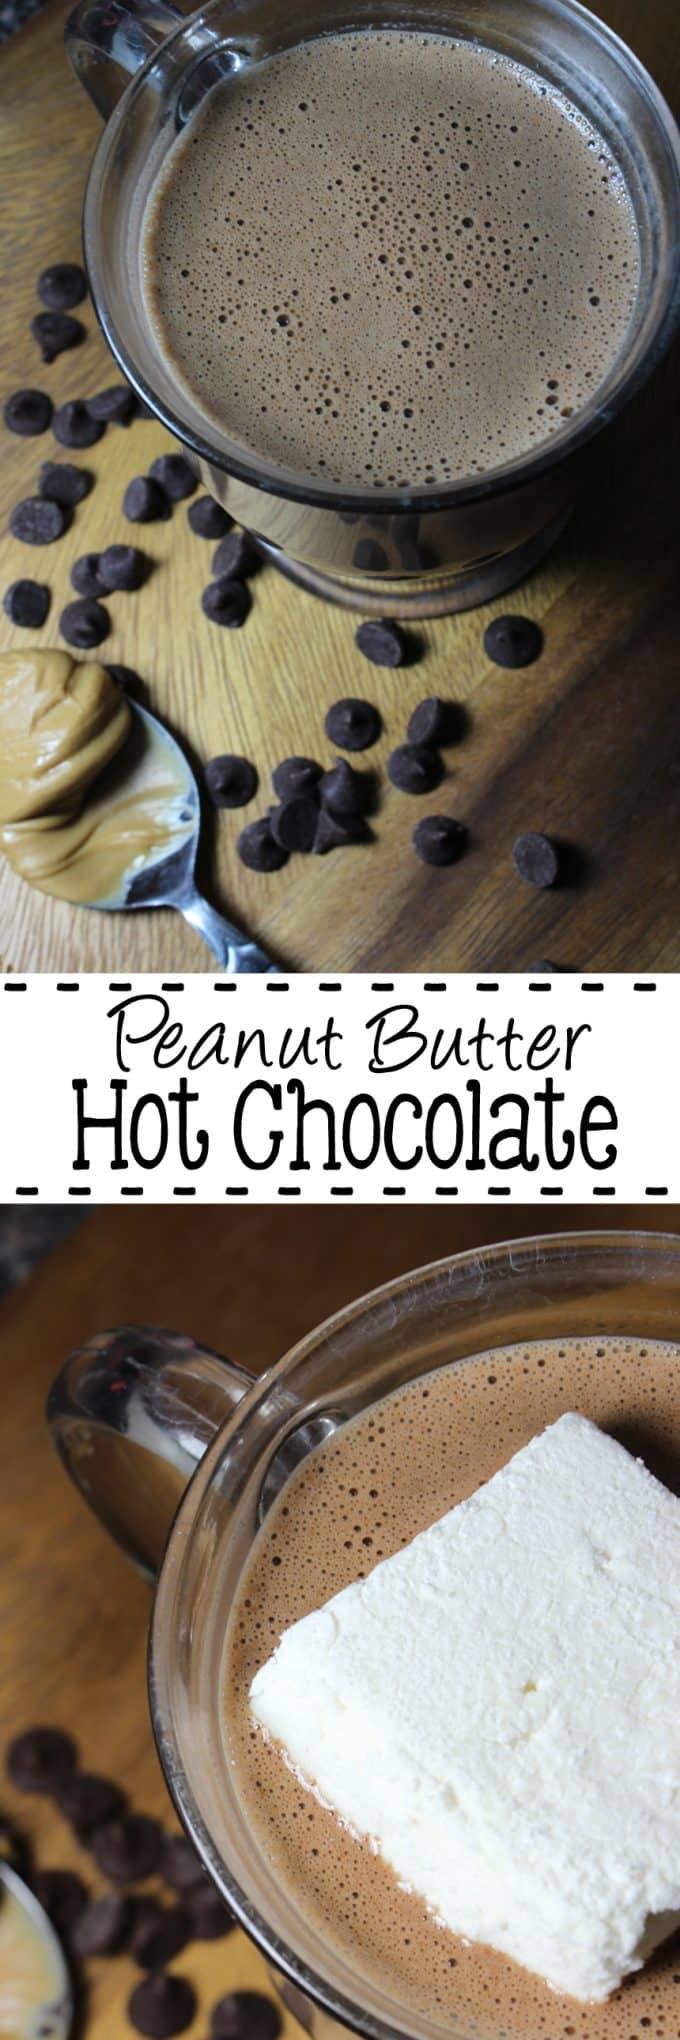 Peanut Butter Hot Chocolate   EverydayMadeFresh.com